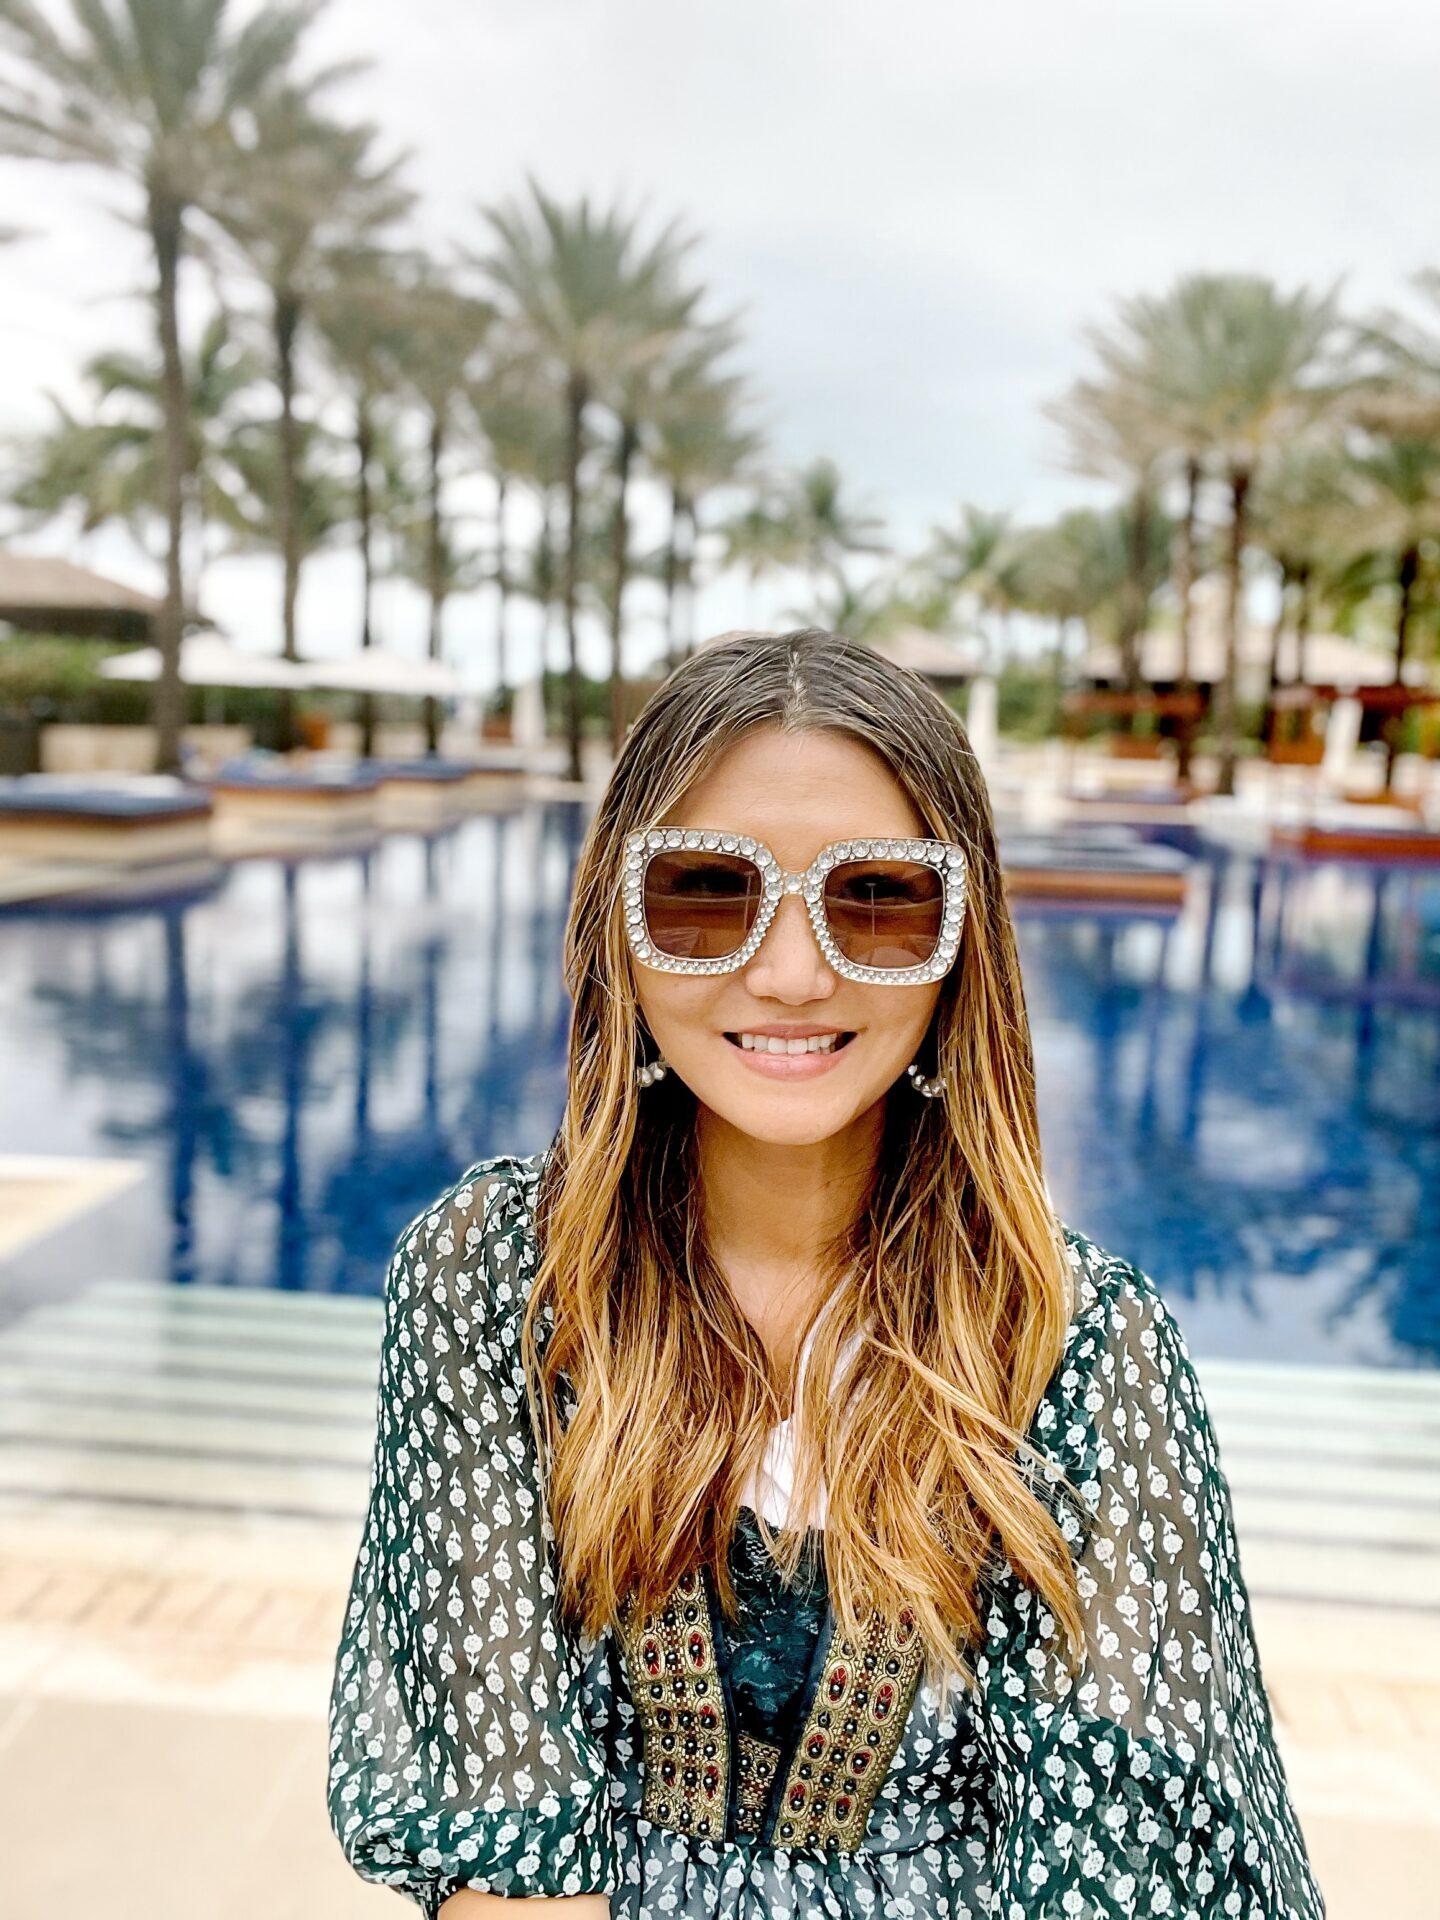 atlantis resort, atlantis bahamas, bahamas hotel, atlantis hotel, atlantis hotel review, atlantis, travel blogger review, review of atlantis